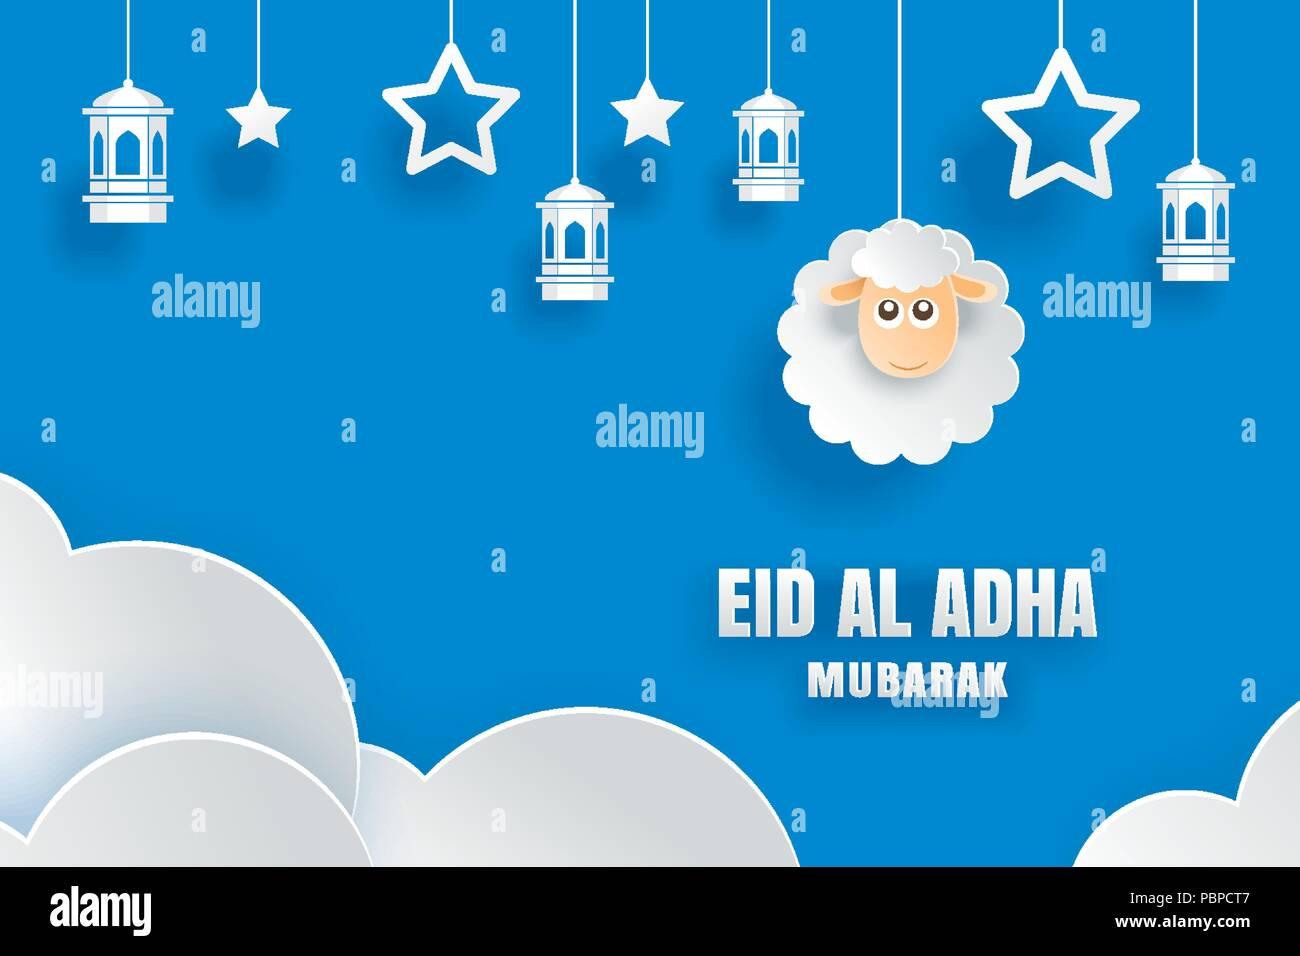 Eid Al Adha Mubarak Celebration Card With Sheep In Paper Art Blue